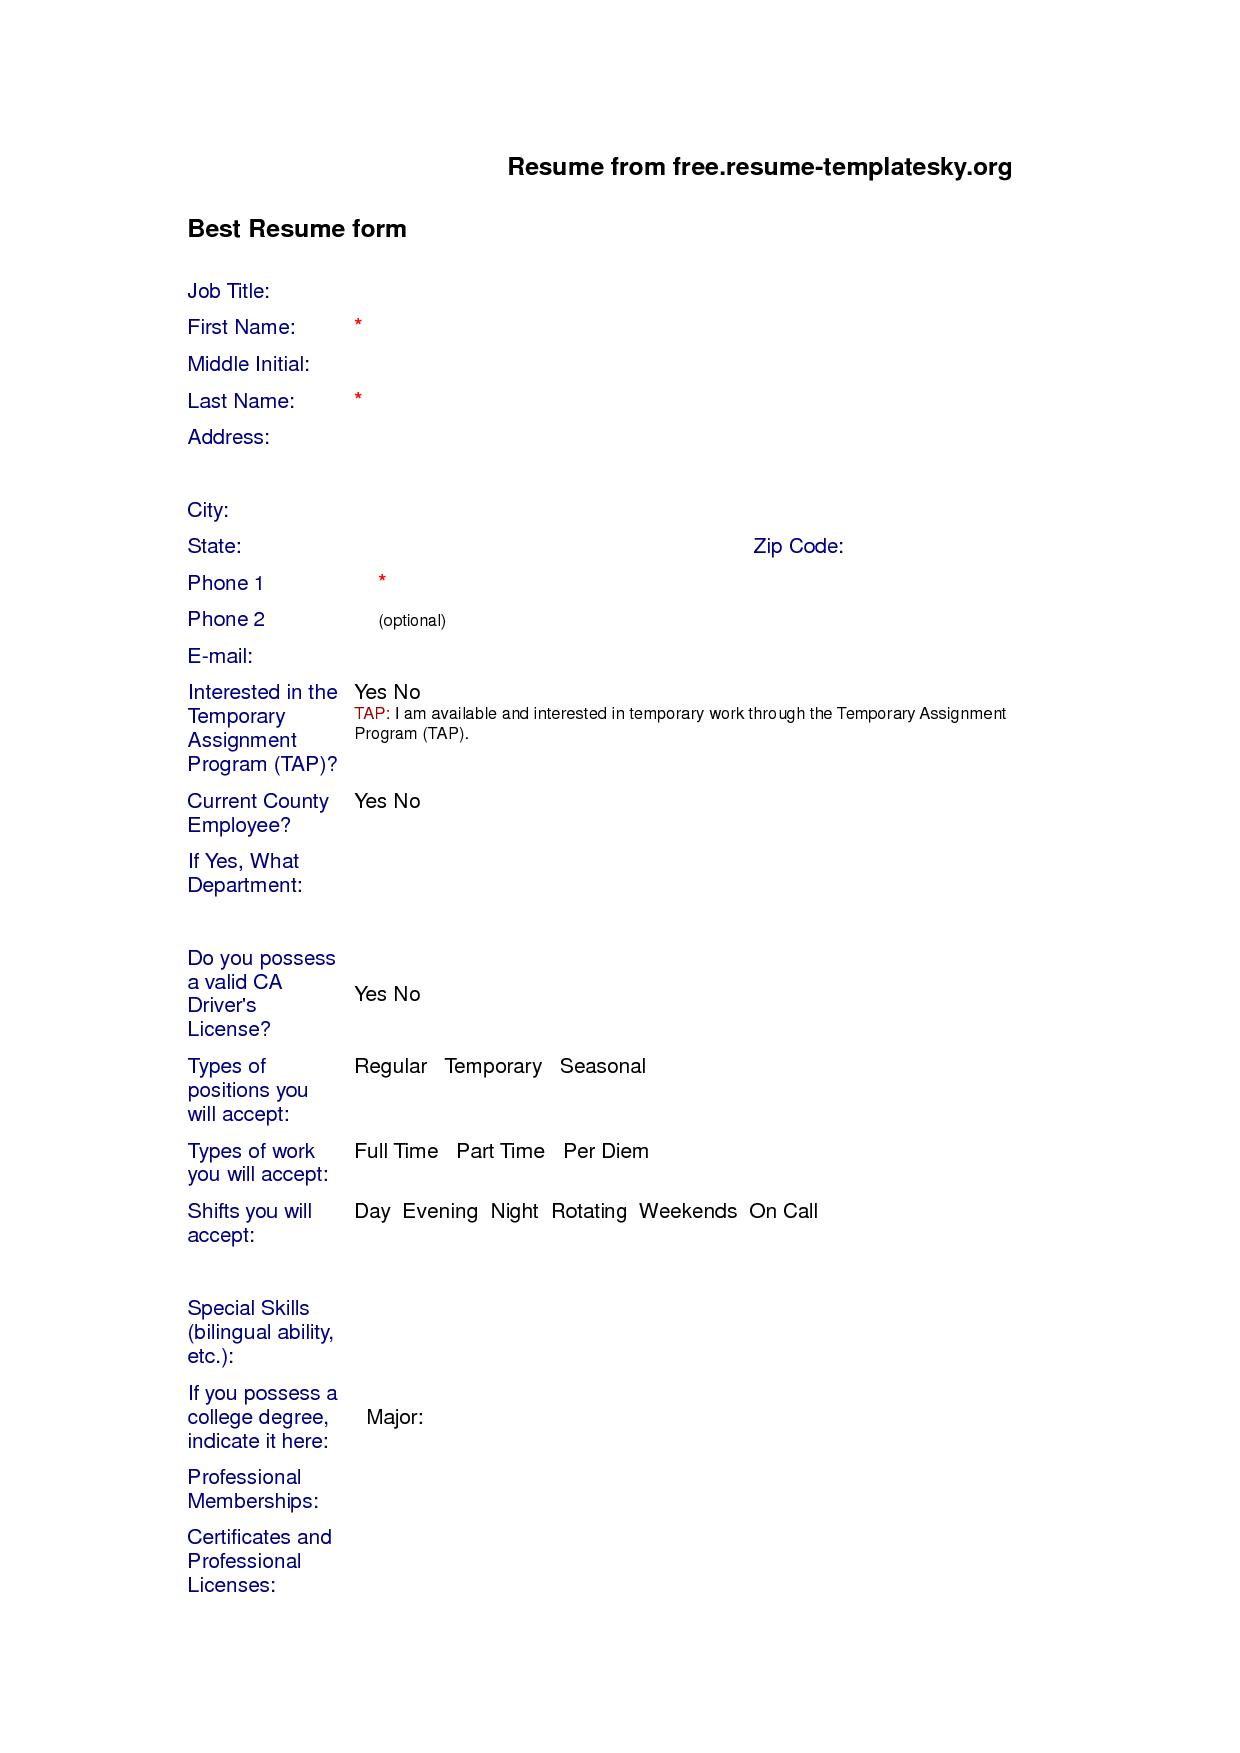 Resume Format Sheet Resume Format Downloadable Resume Template Resume Format Free Download Resume Format Download